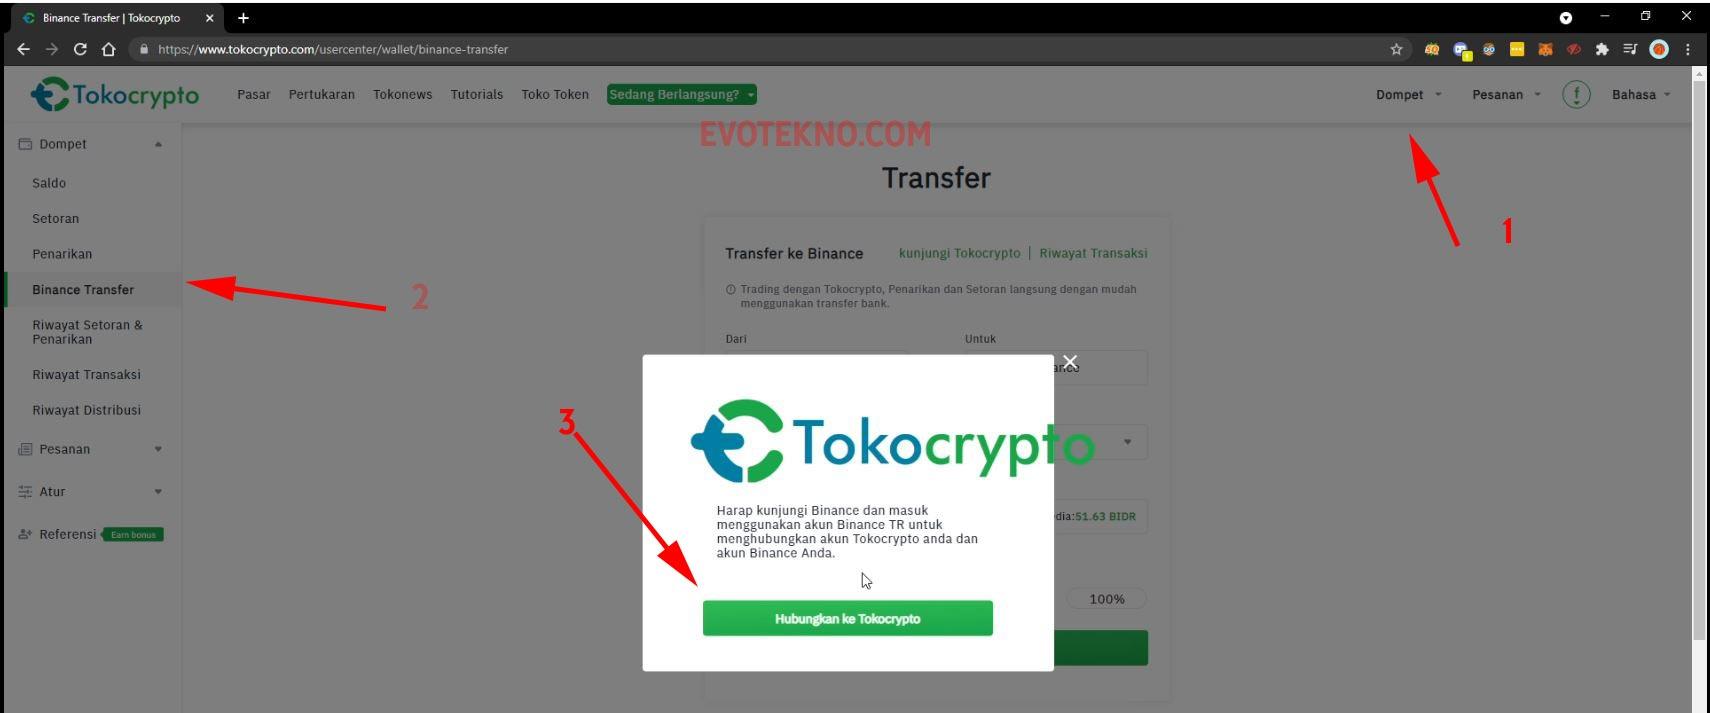 Tokocrypto - Dompet - Binance Transfer - Hubungkan ke Binance